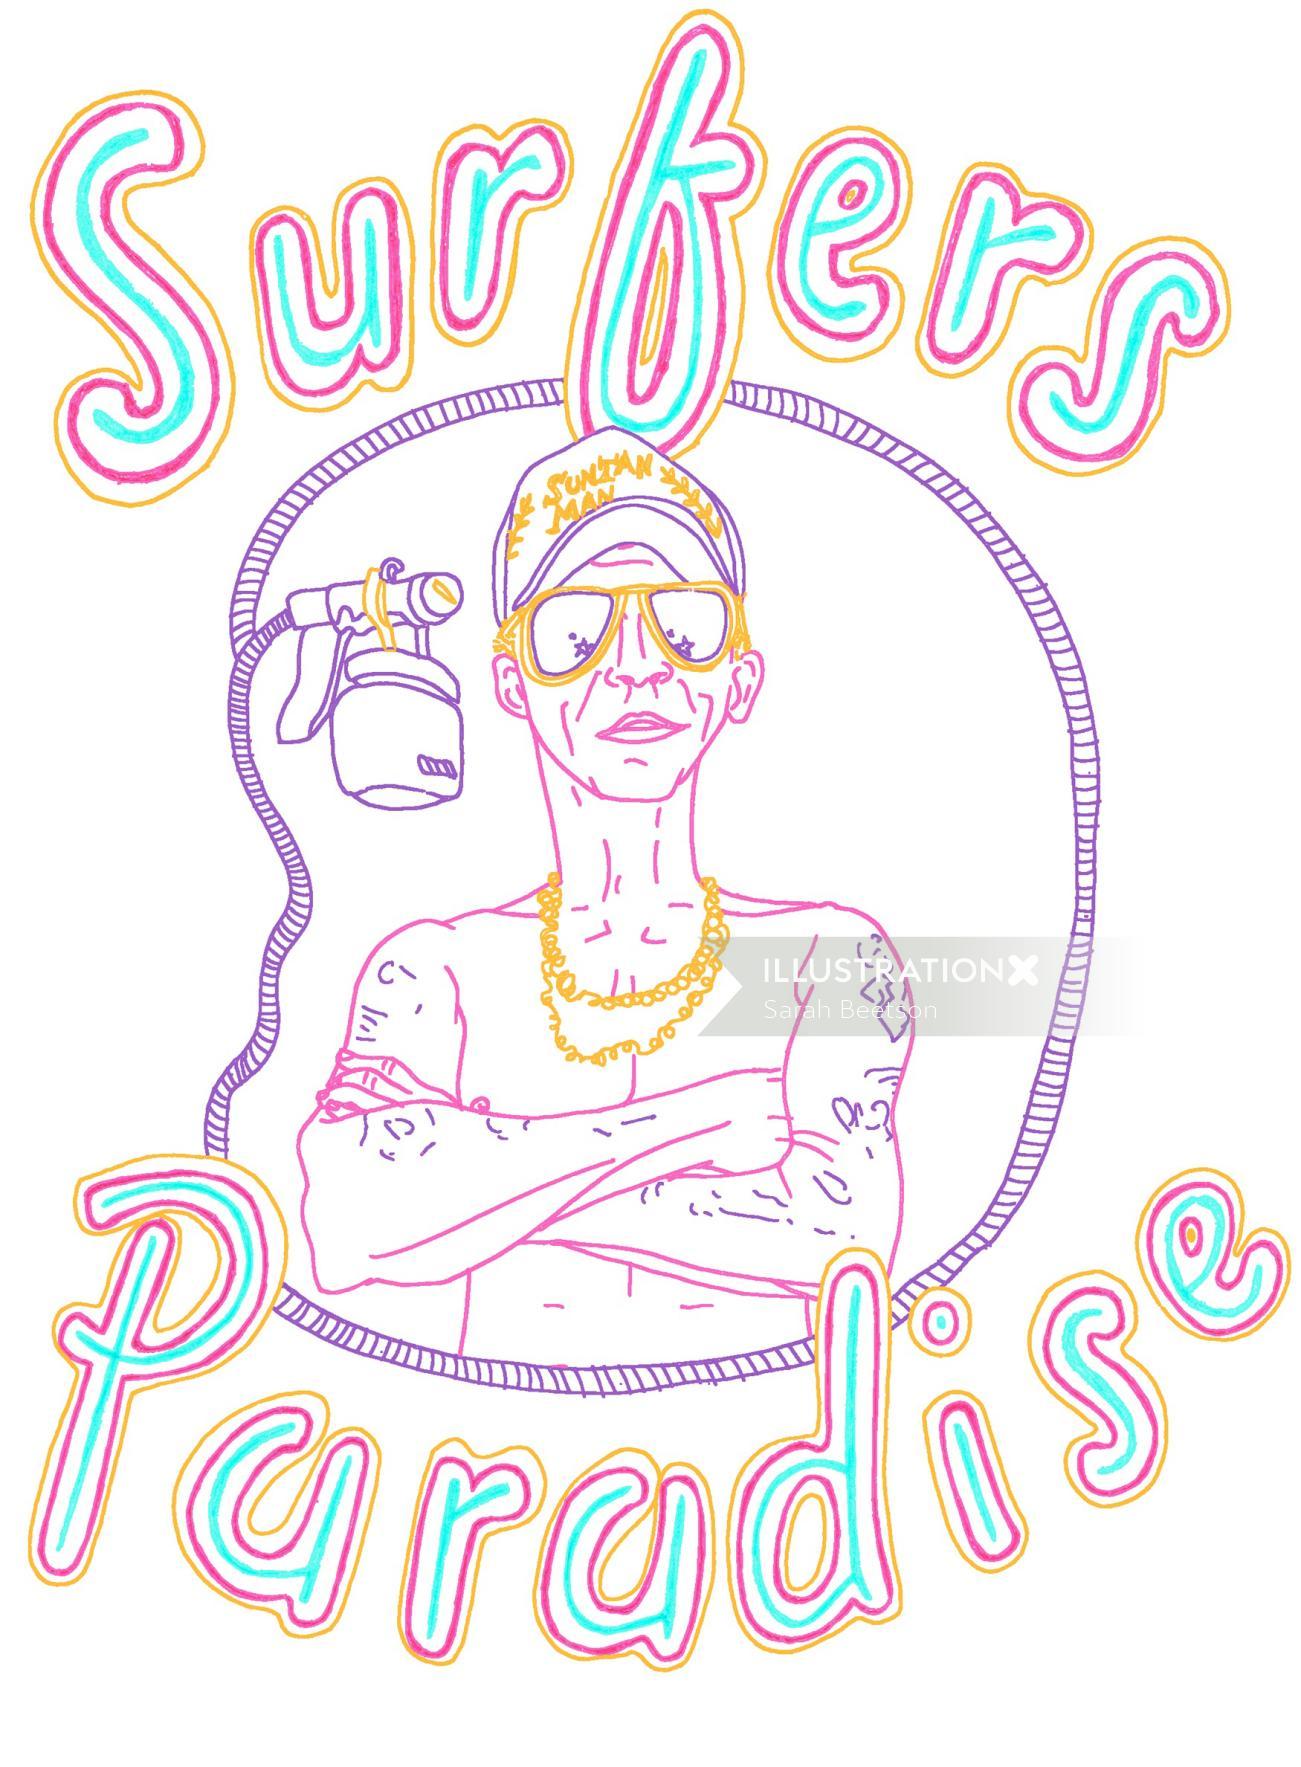 Lettering art of surfers paradise